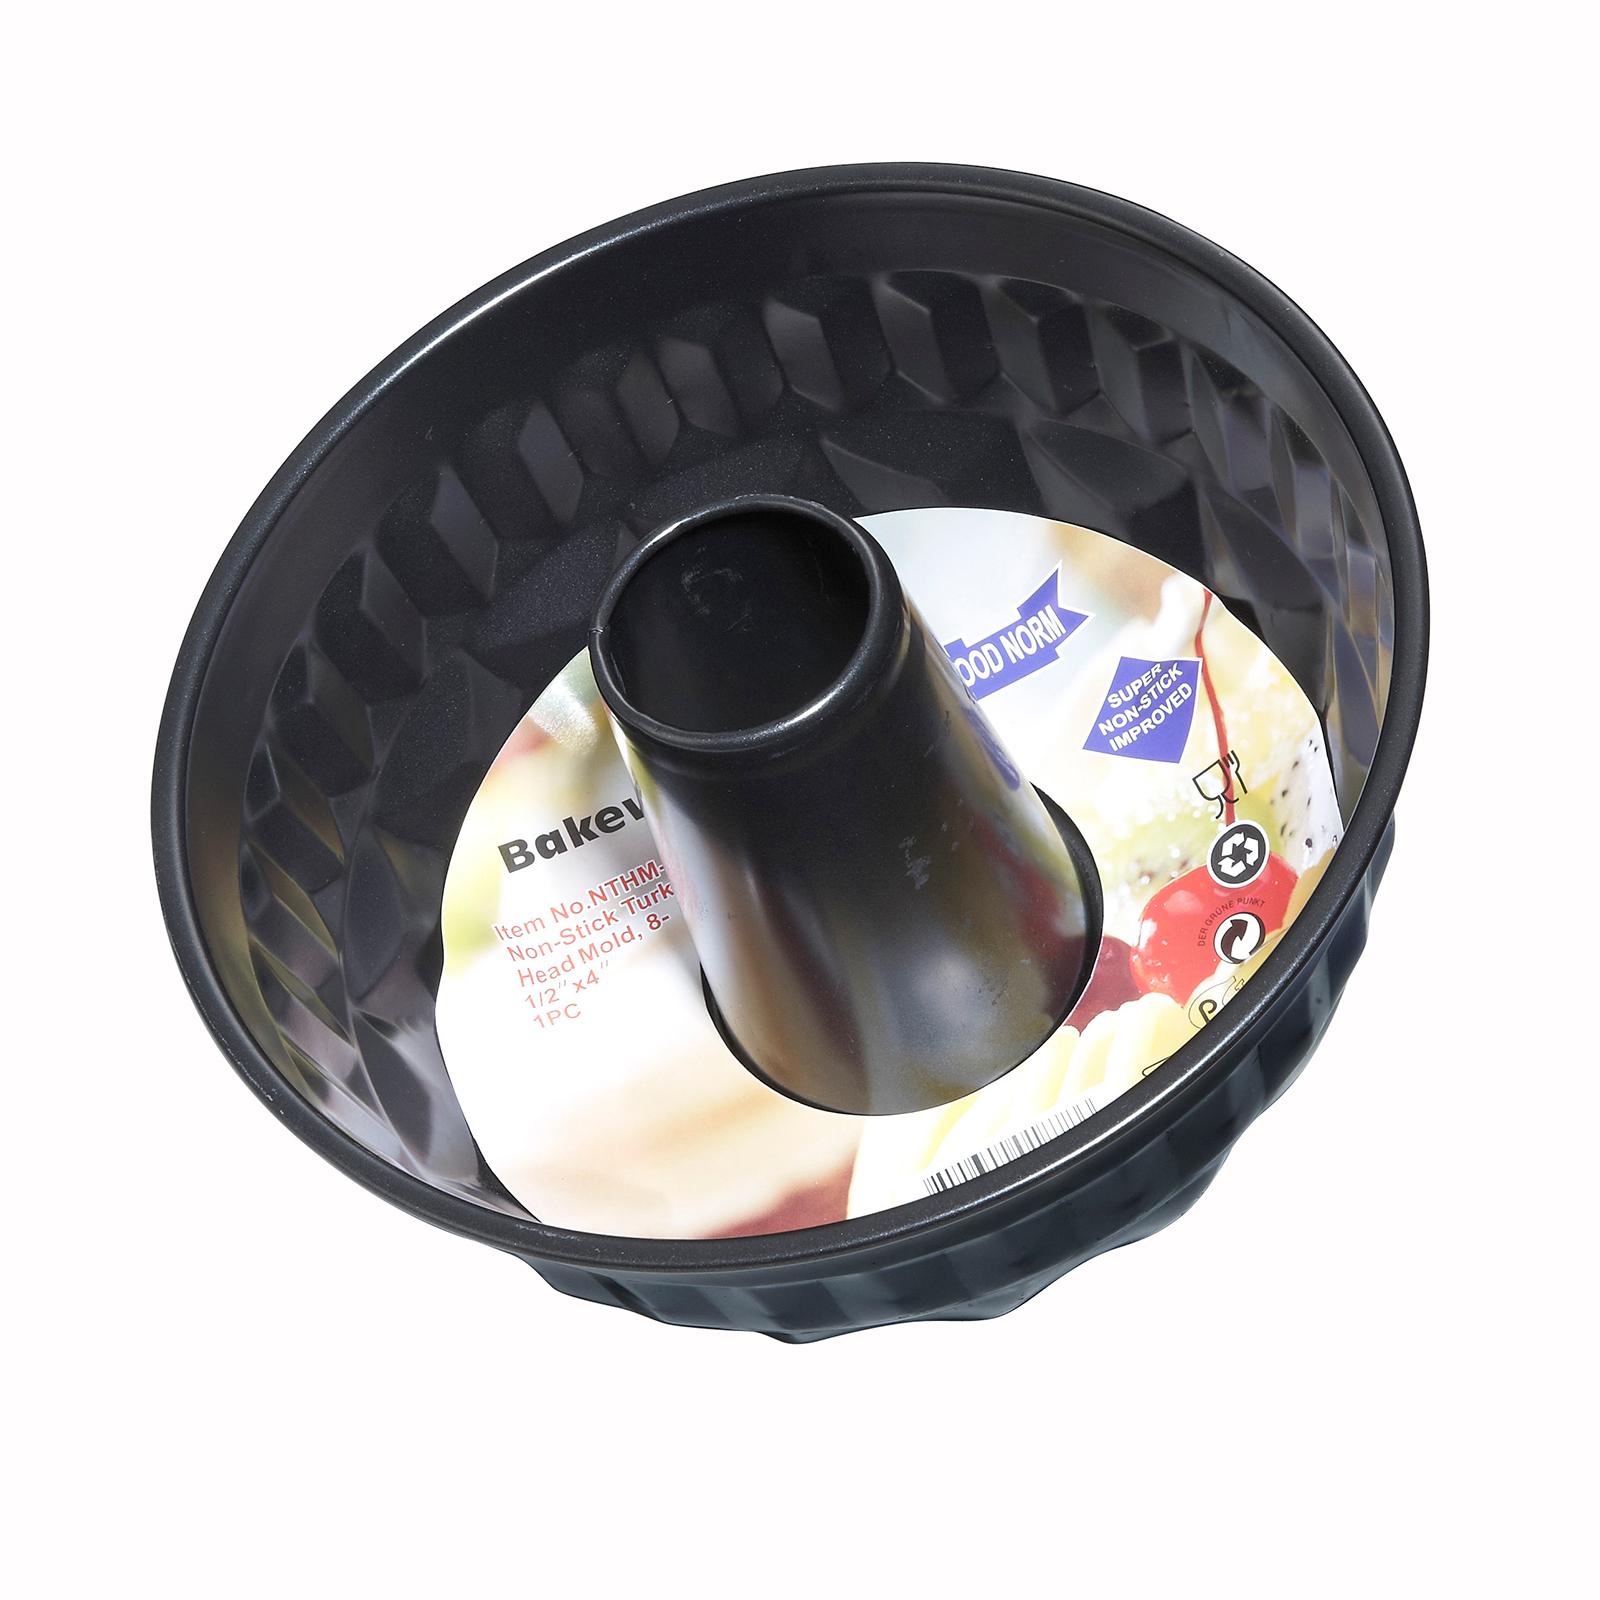 1850-84 Winco NTHM-8 cake mold pan